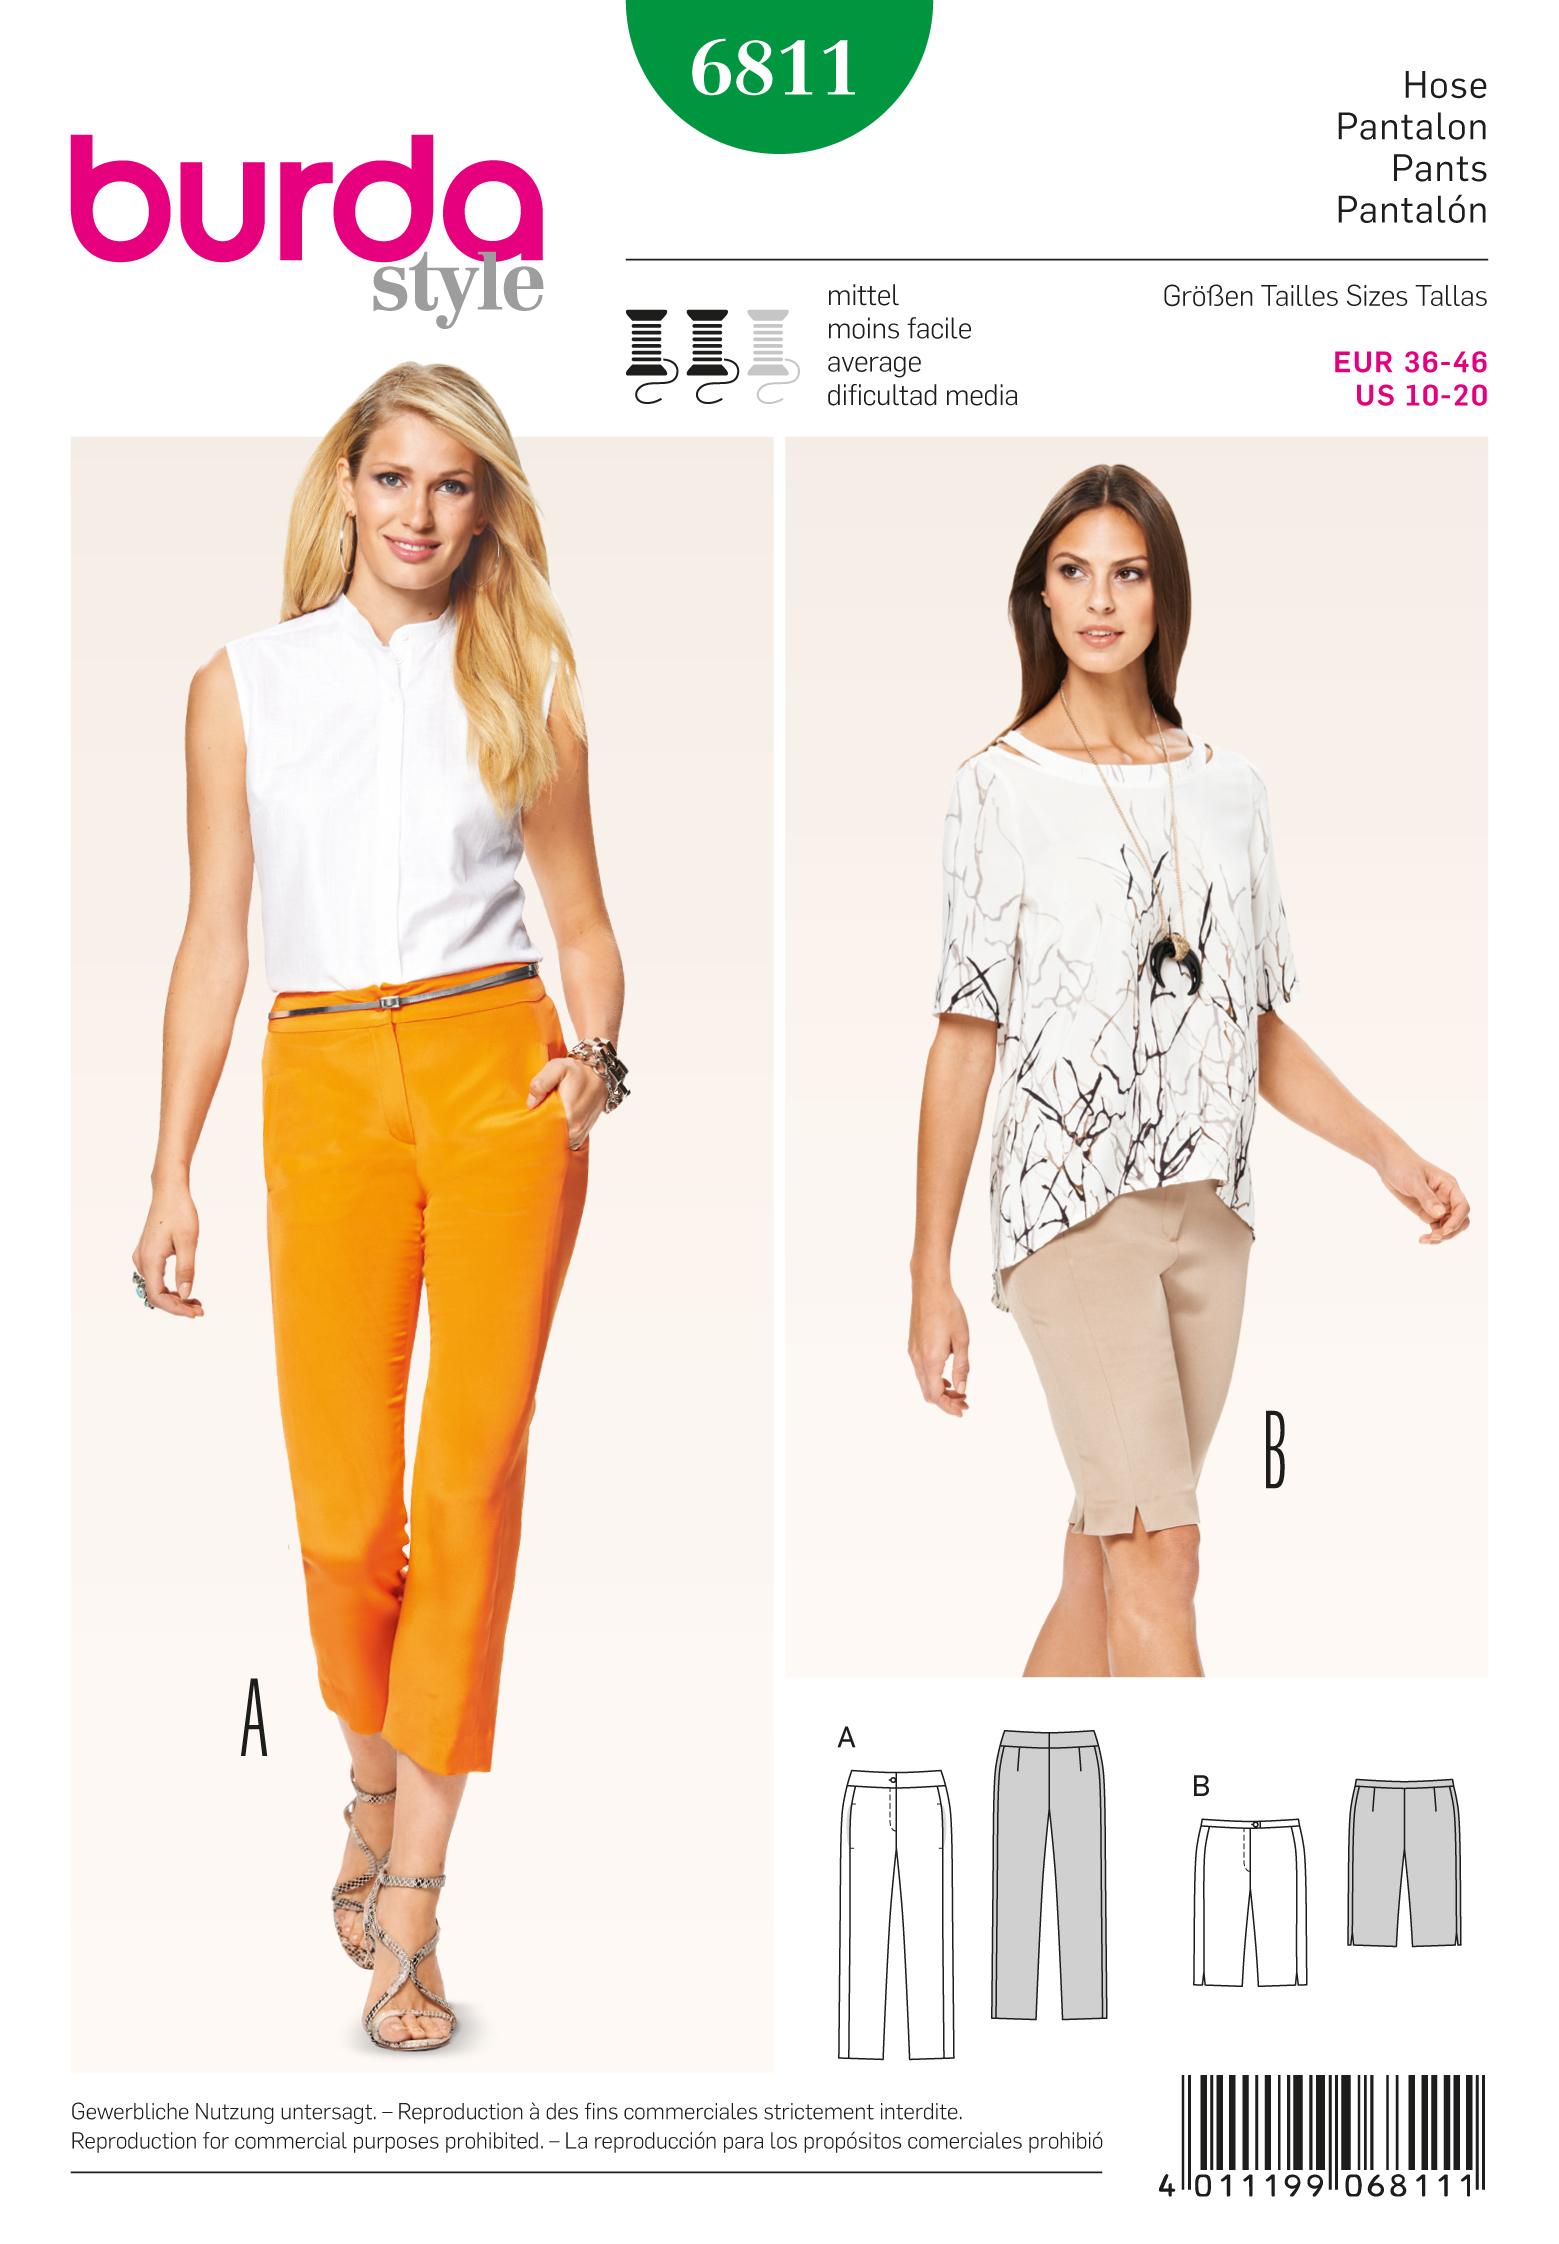 Burda 6811 Burda Style Pants, Jumpsuits